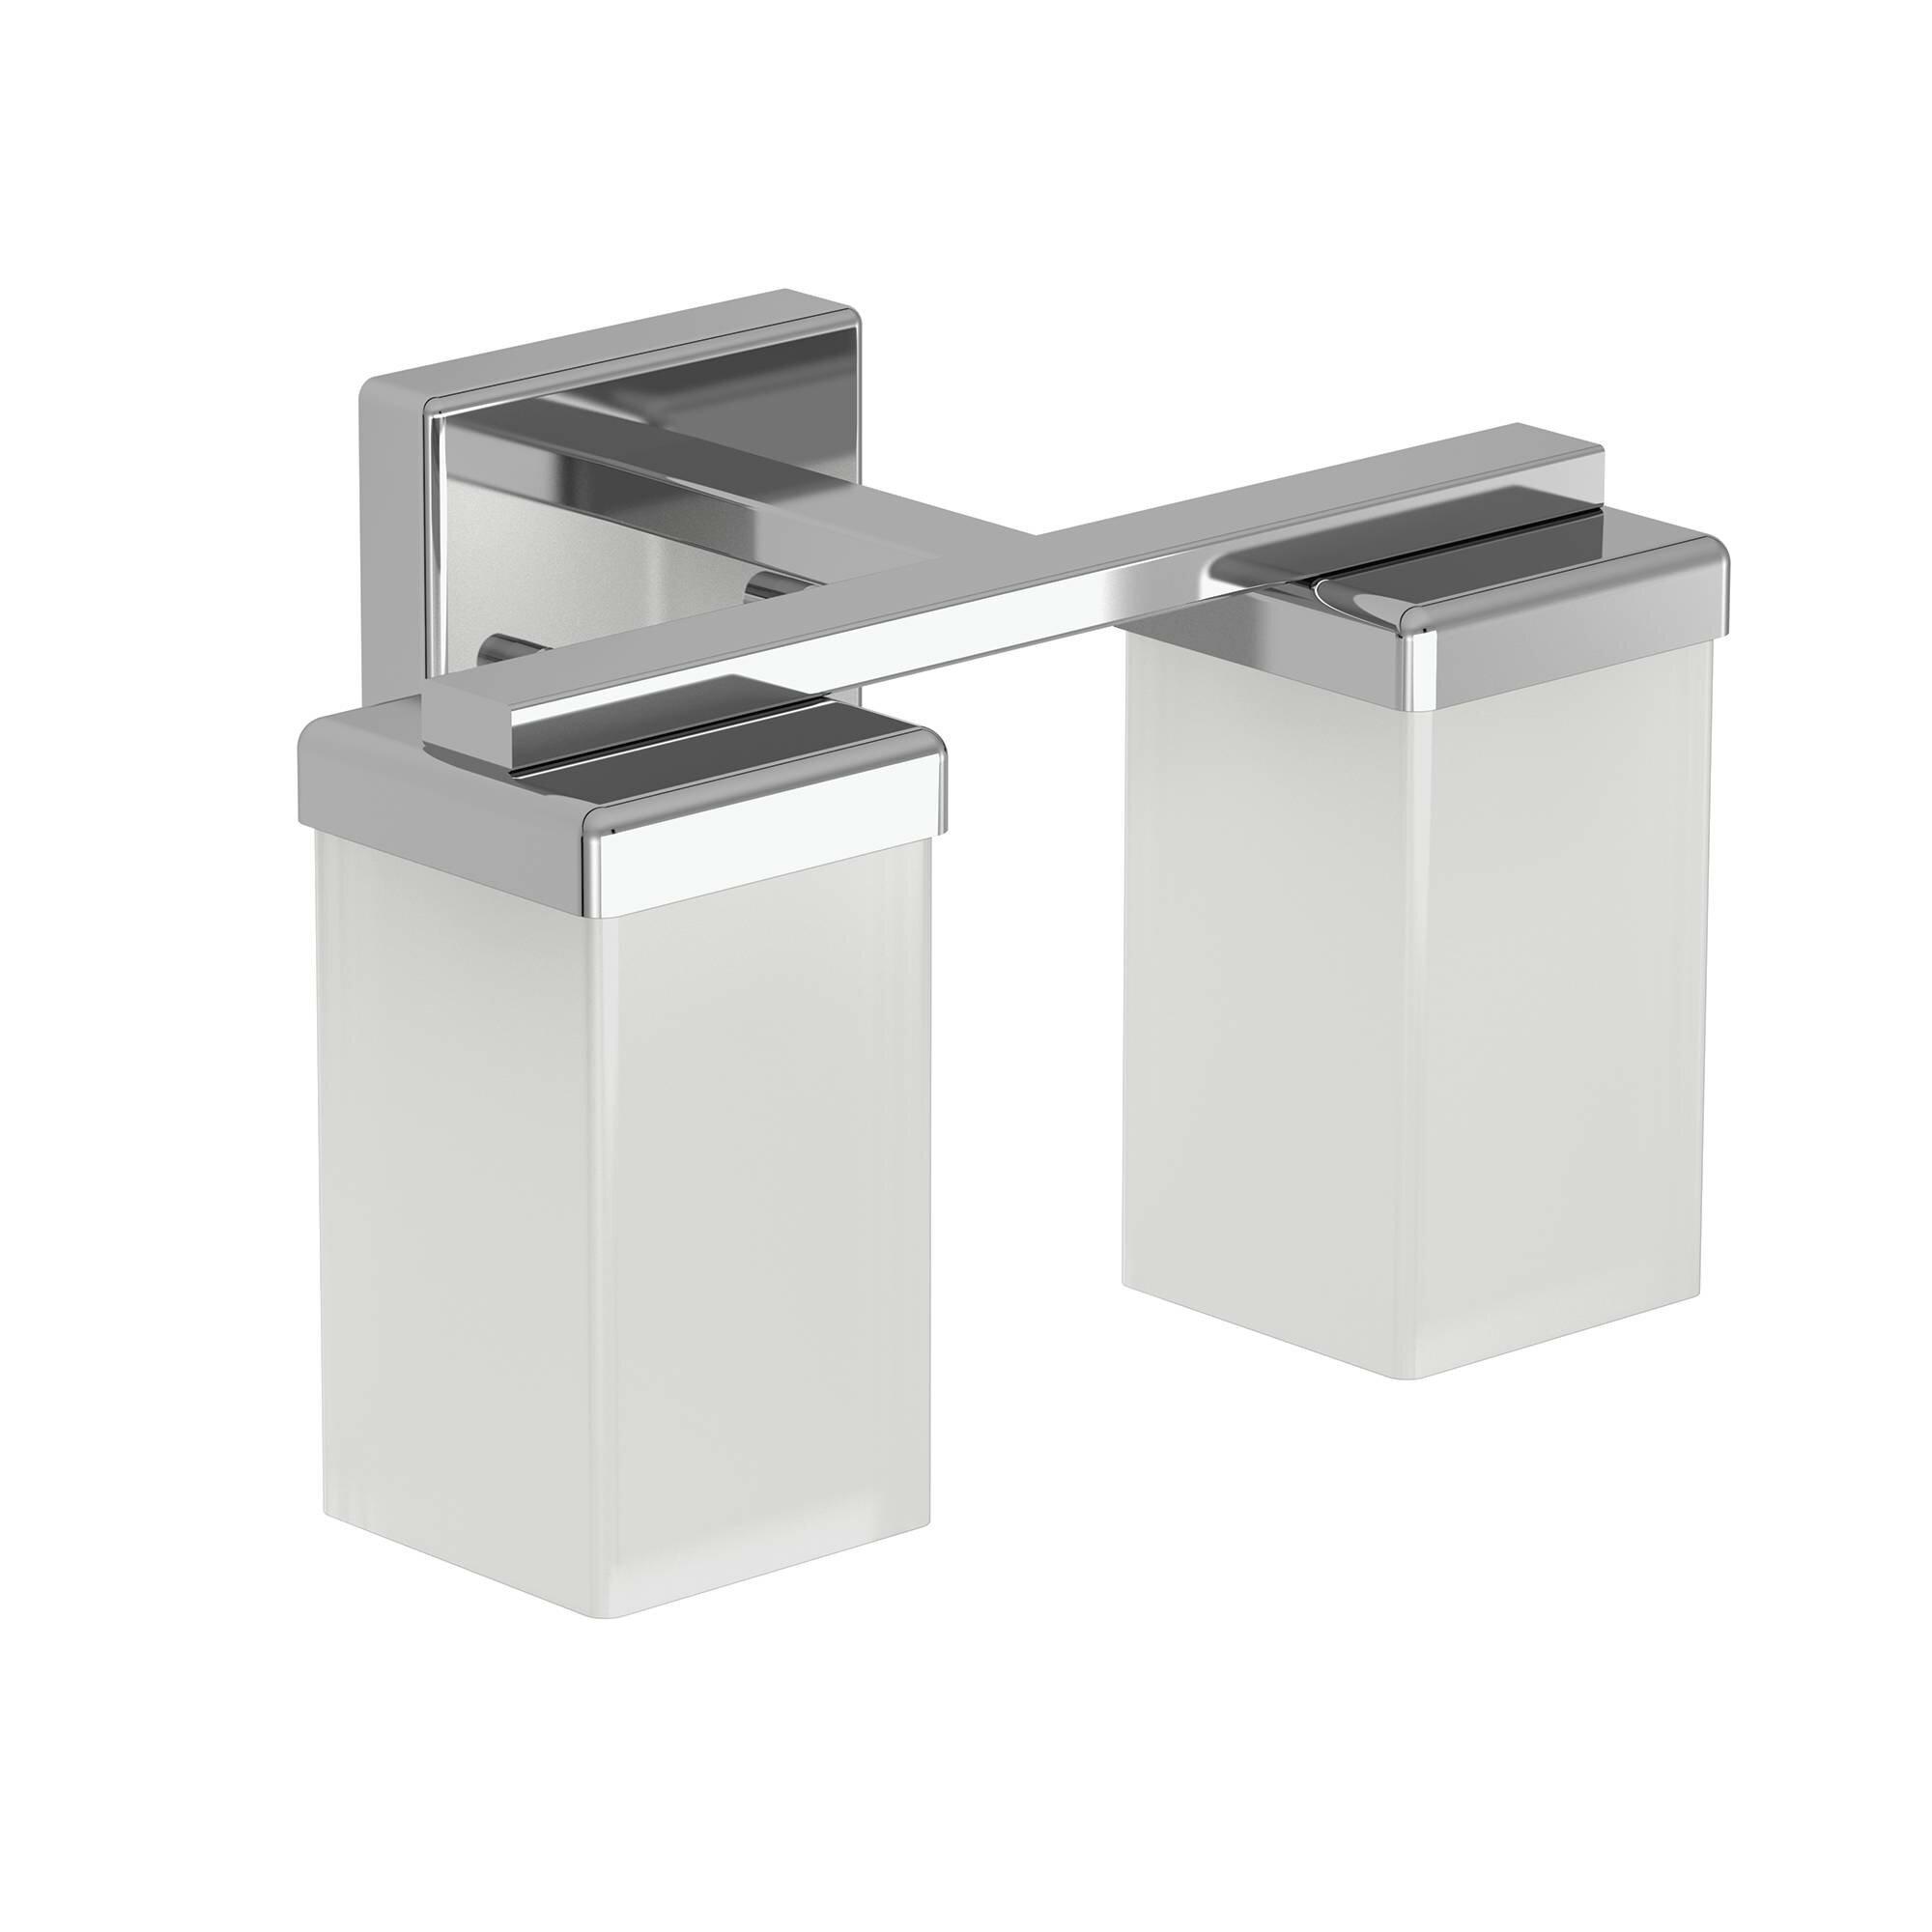 Moen Yb8863ch 90 Degree Chrome Vanity Light Bathroom Lighting: Moen 90 Degree 2 Light Vanity Light & Reviews